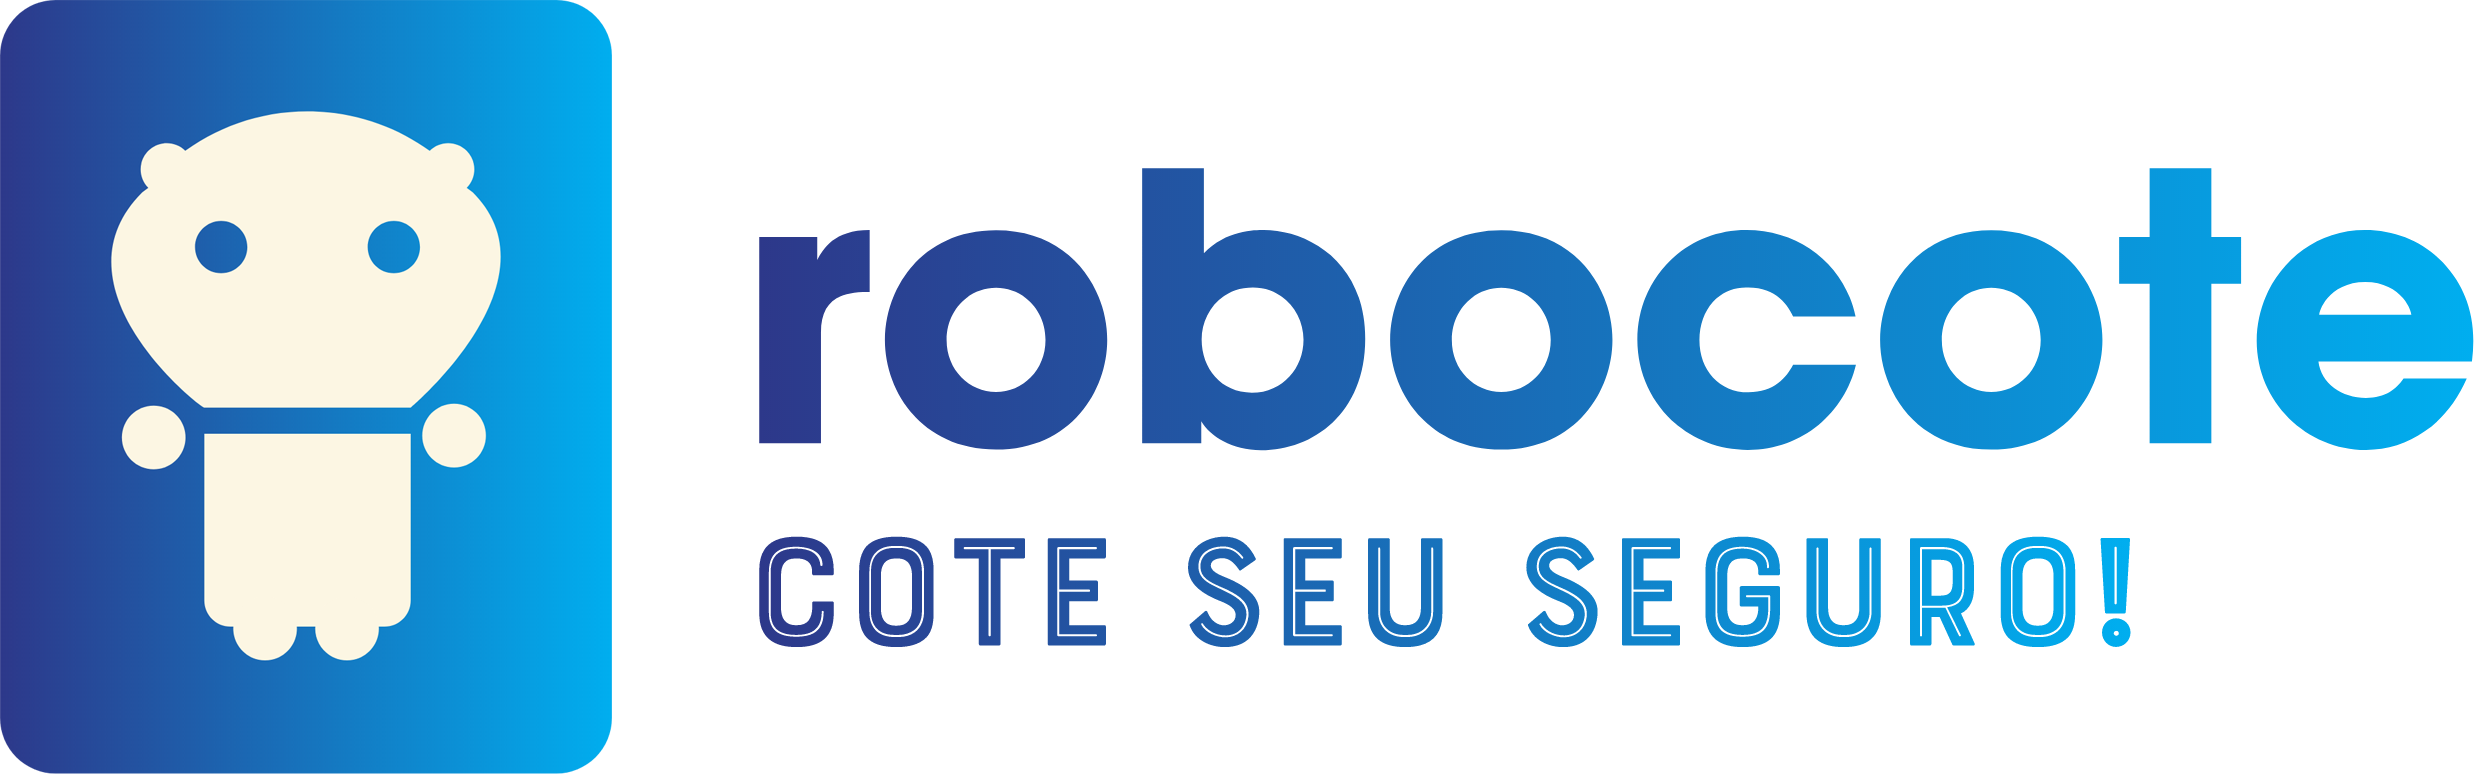 RobocoteApp